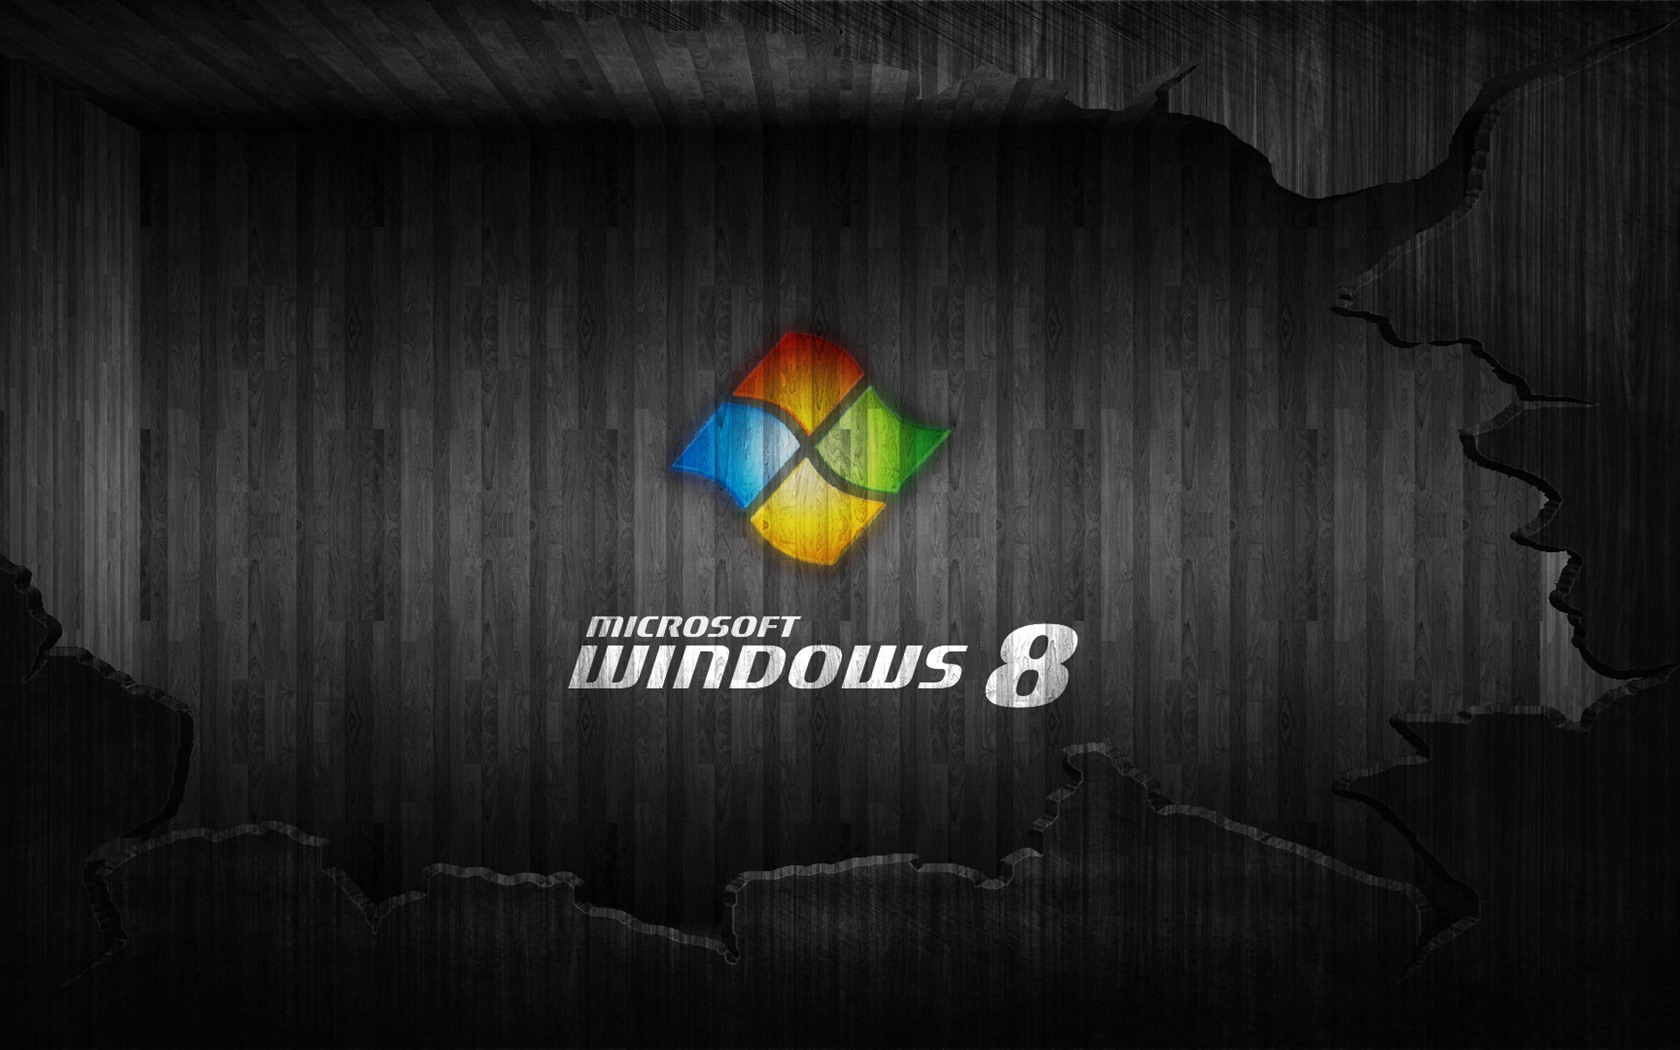 ... Fond d'écran Windows 8 Theme (1) - Système Fond d'écran - V3 Fond d